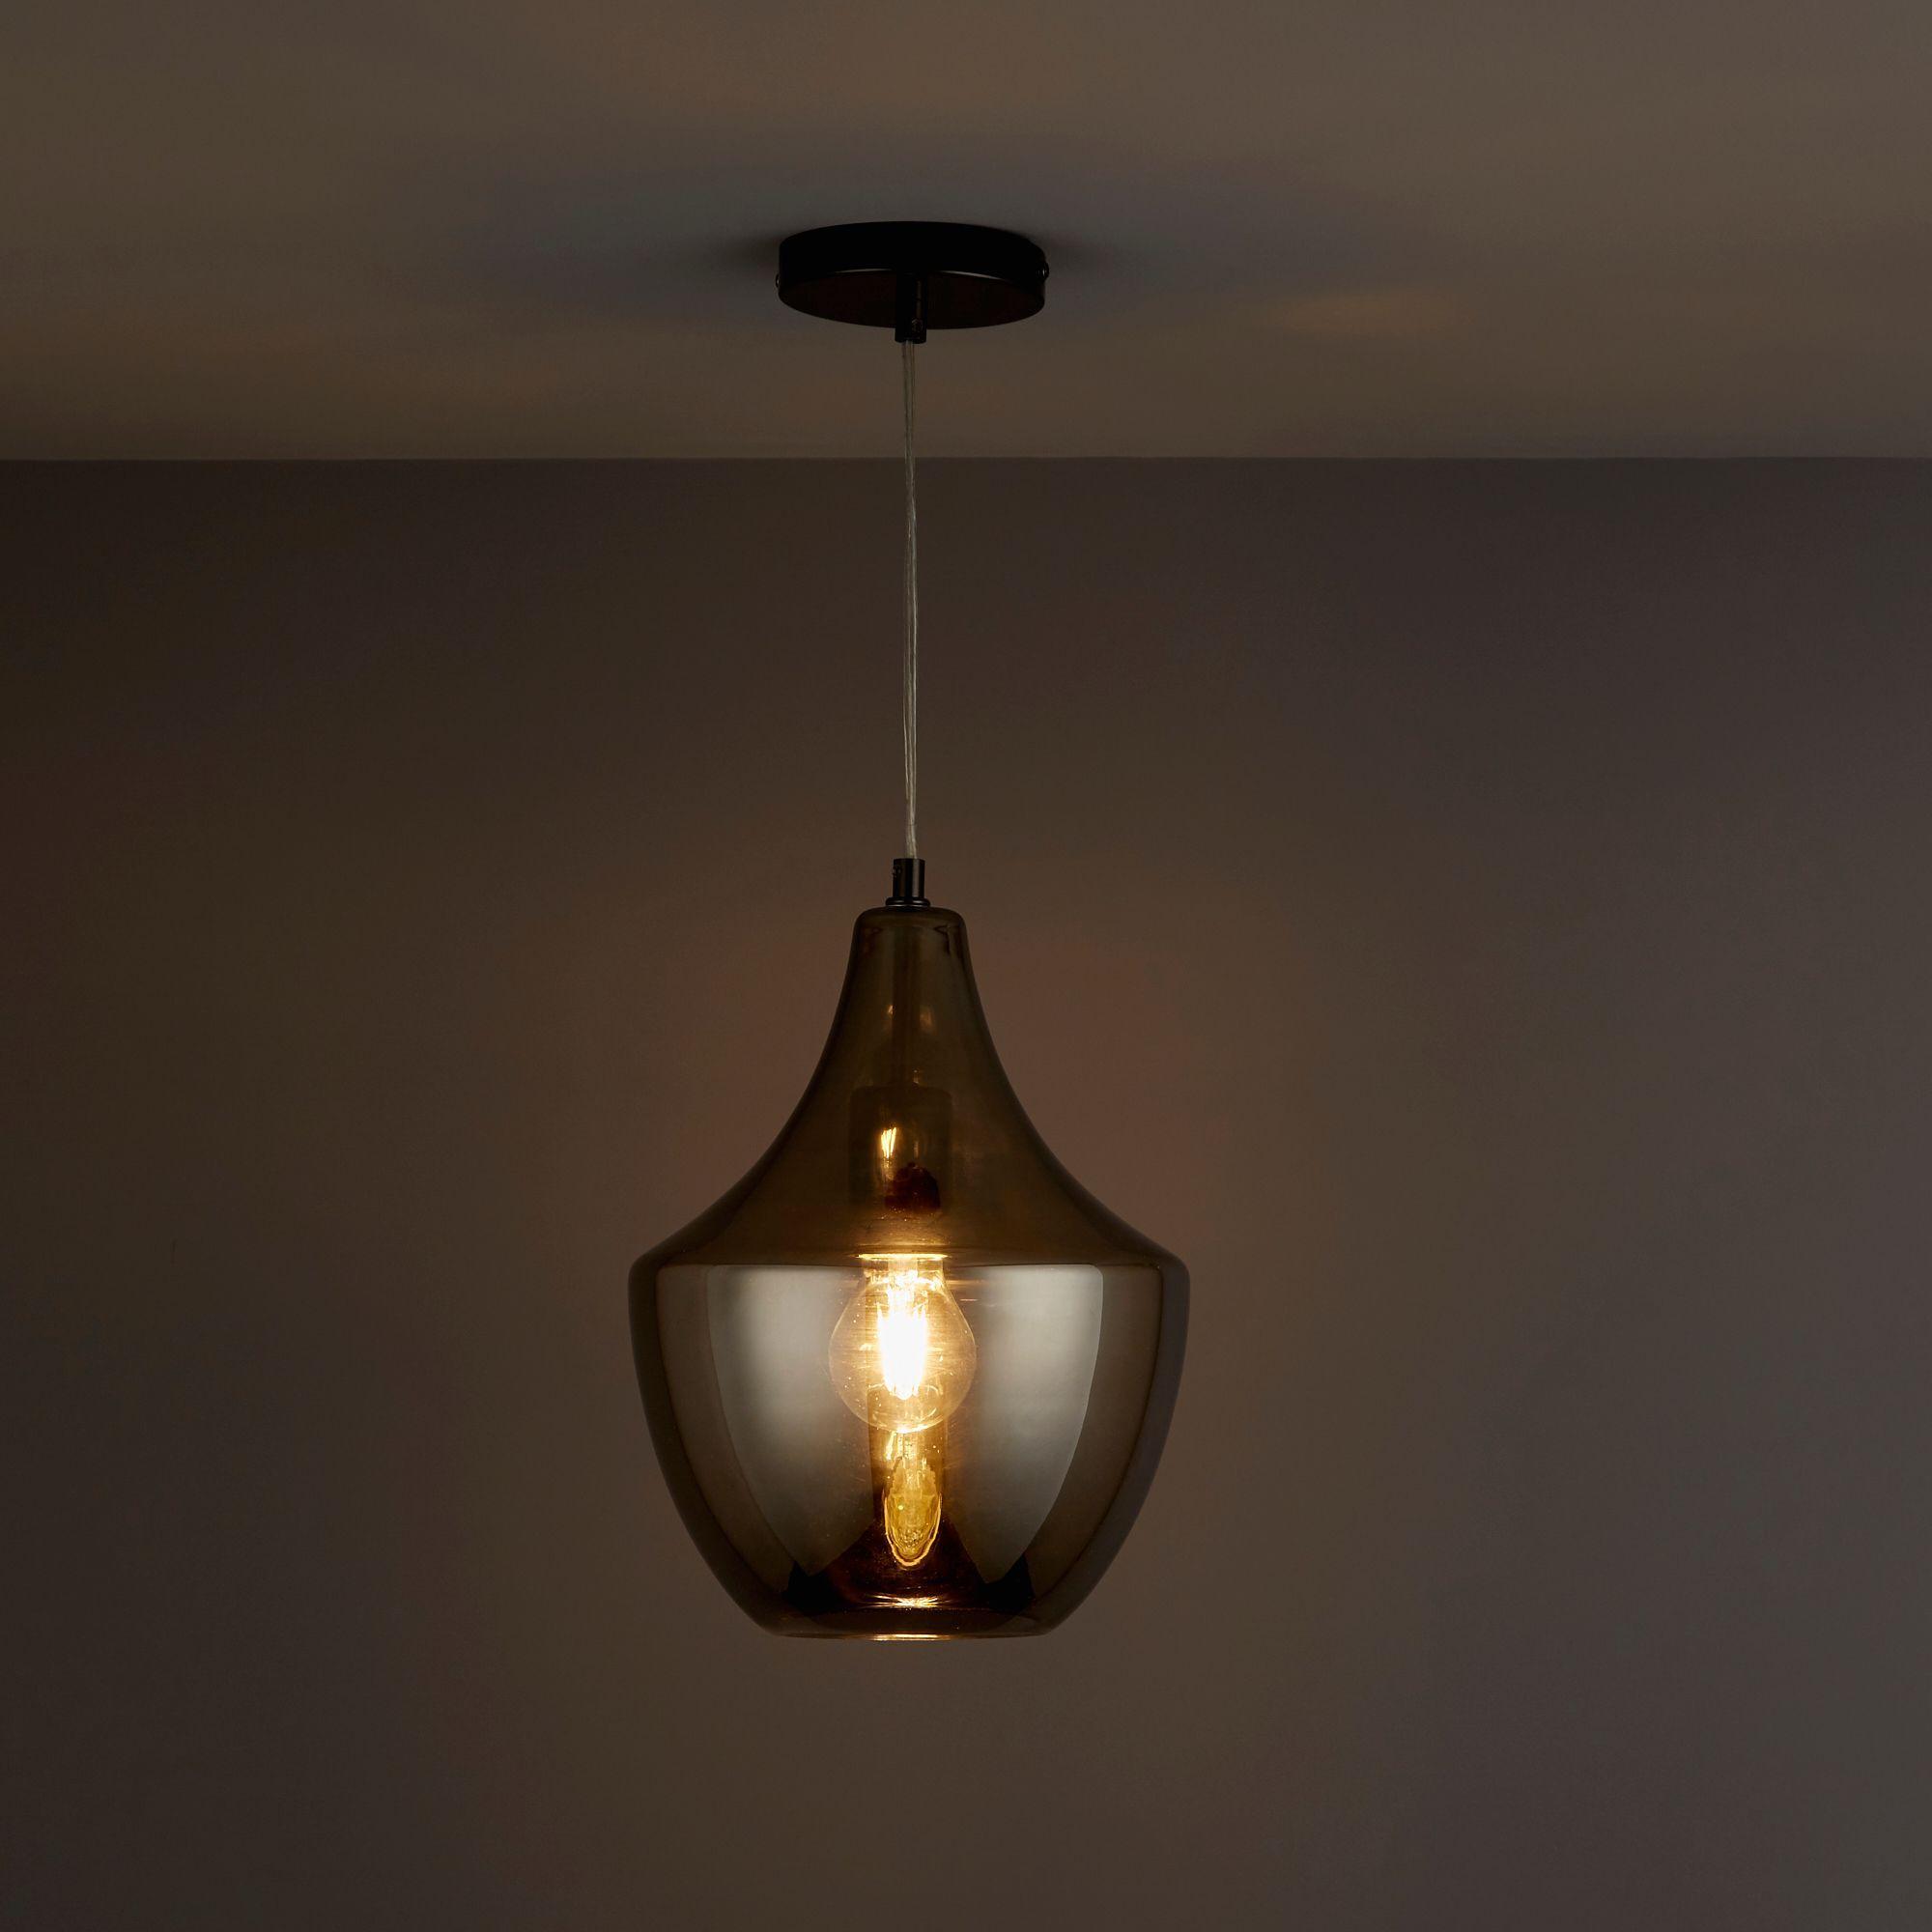 Honor Smoked Pendant ceiling light